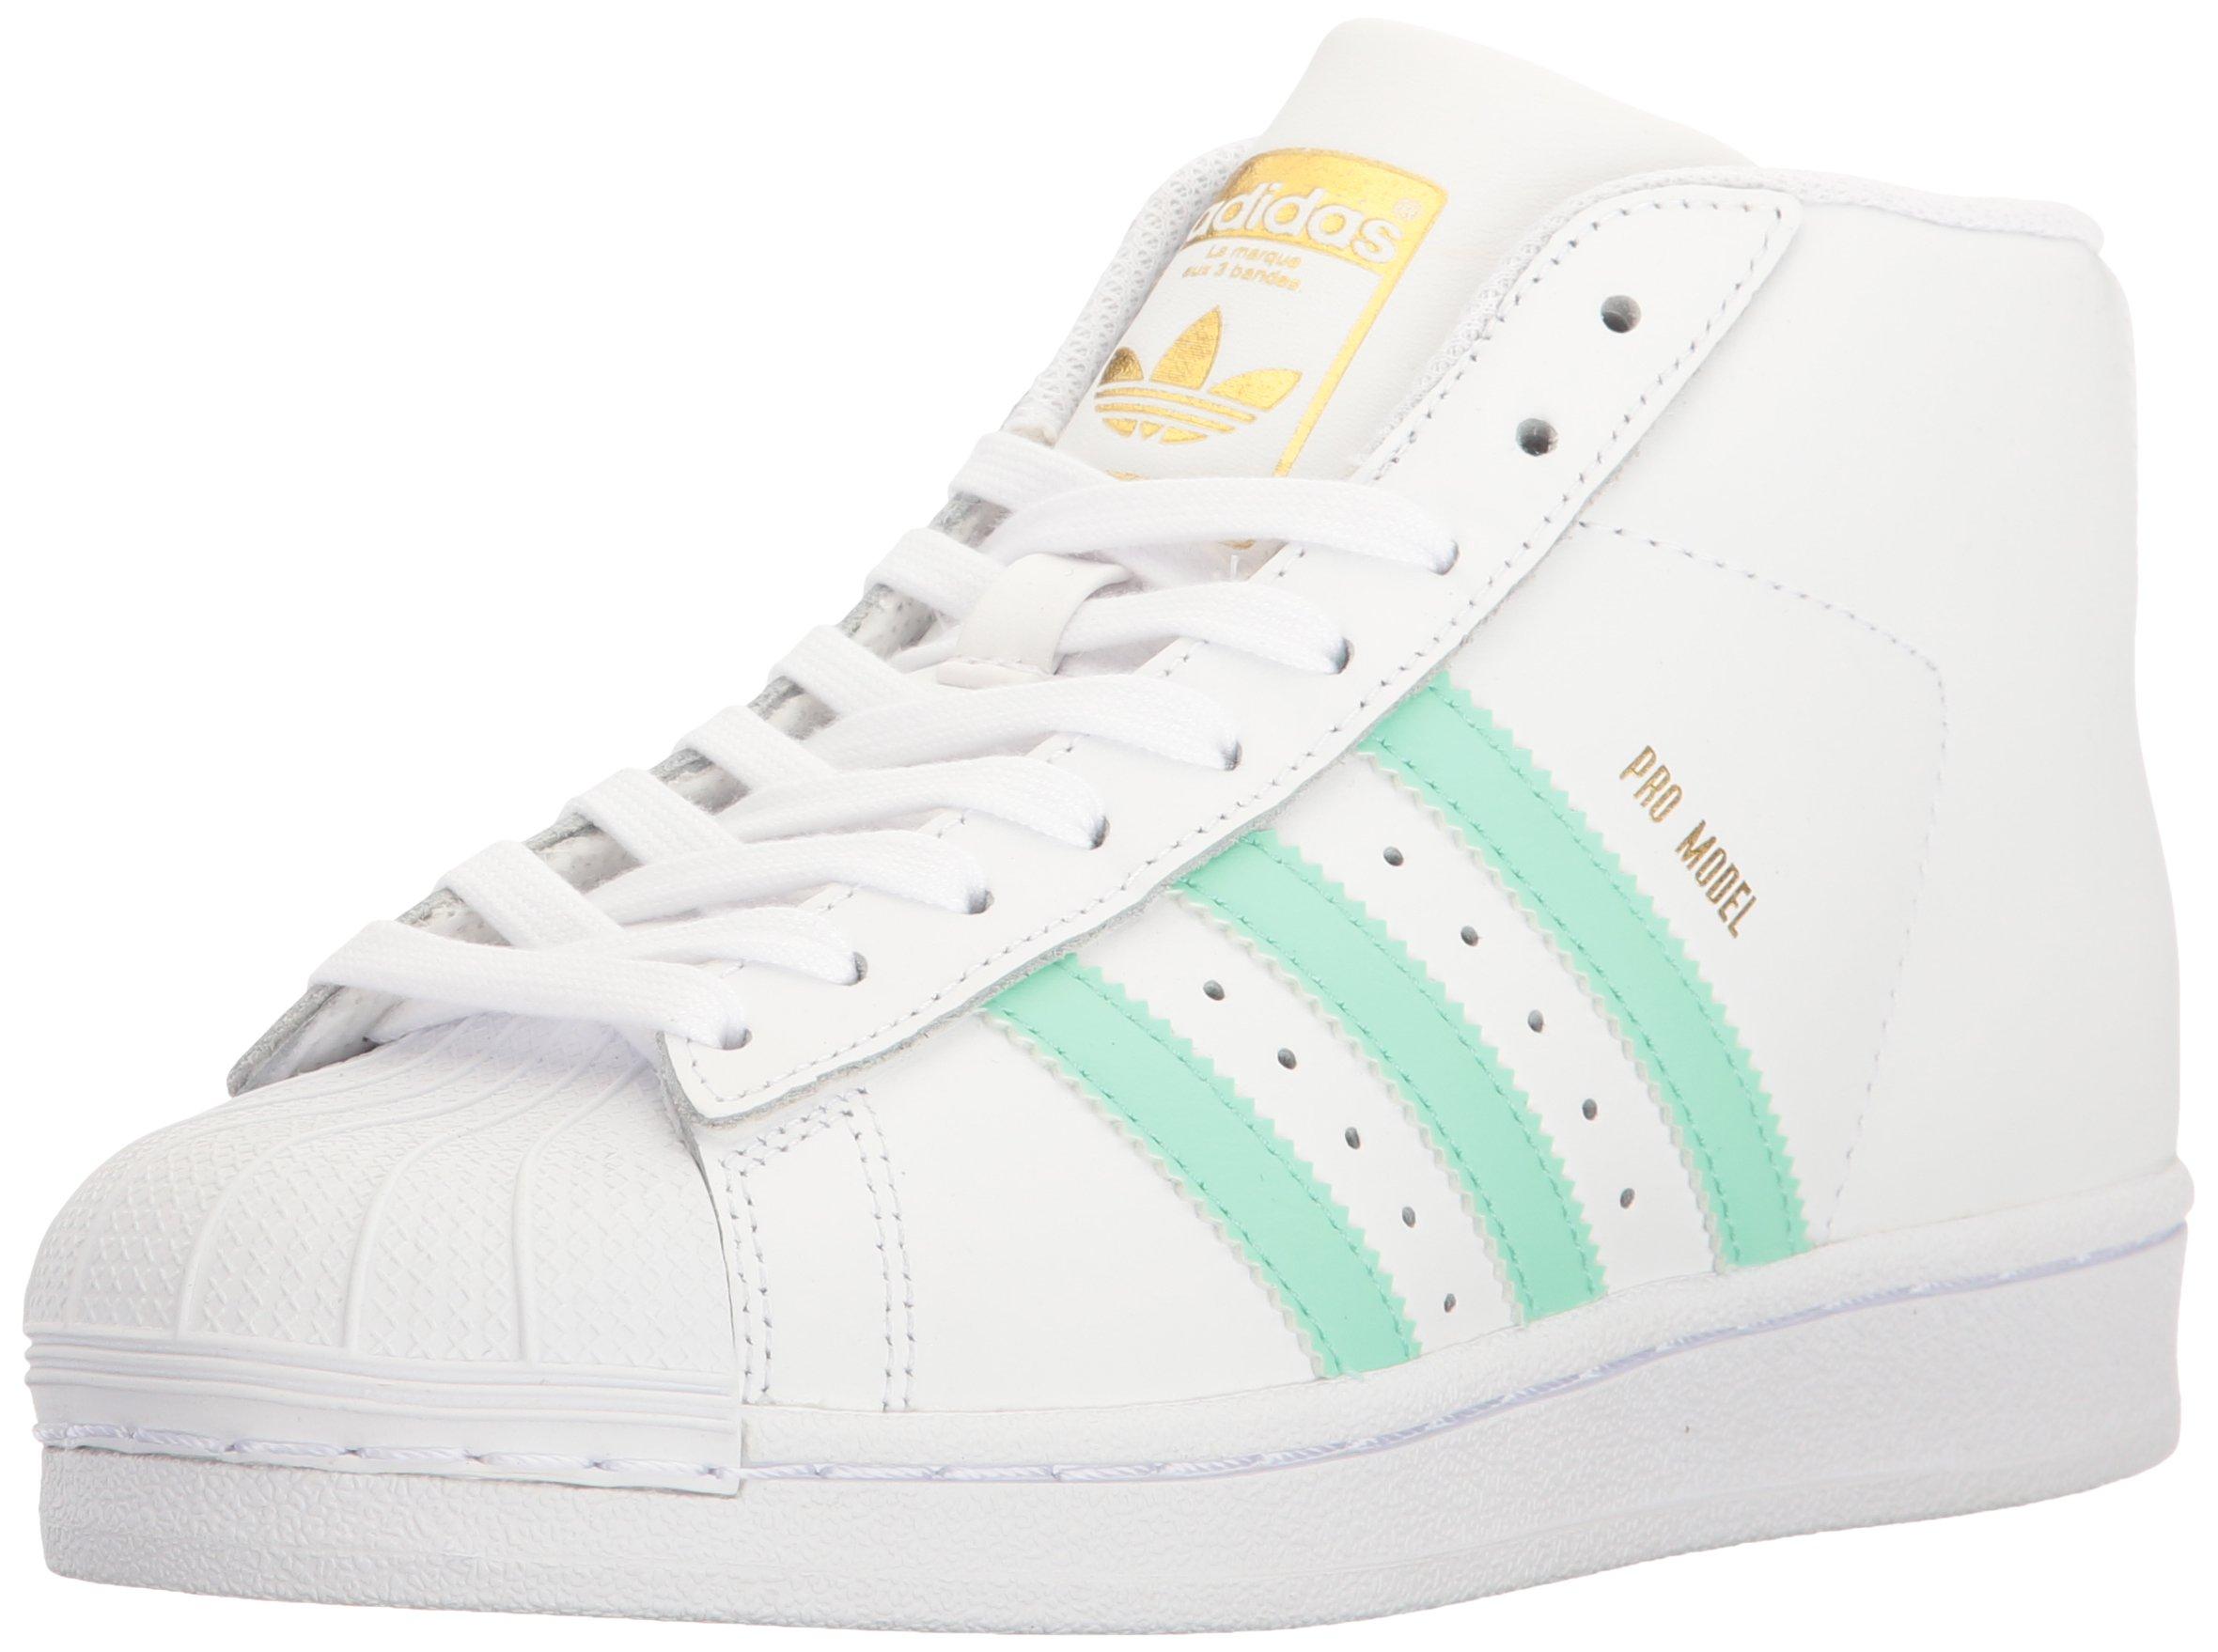 adidas Originals Boys' Pro Model J Sneaker, White/Easy Green Metallic/Gold, 4 M US Big Kid by adidas Originals